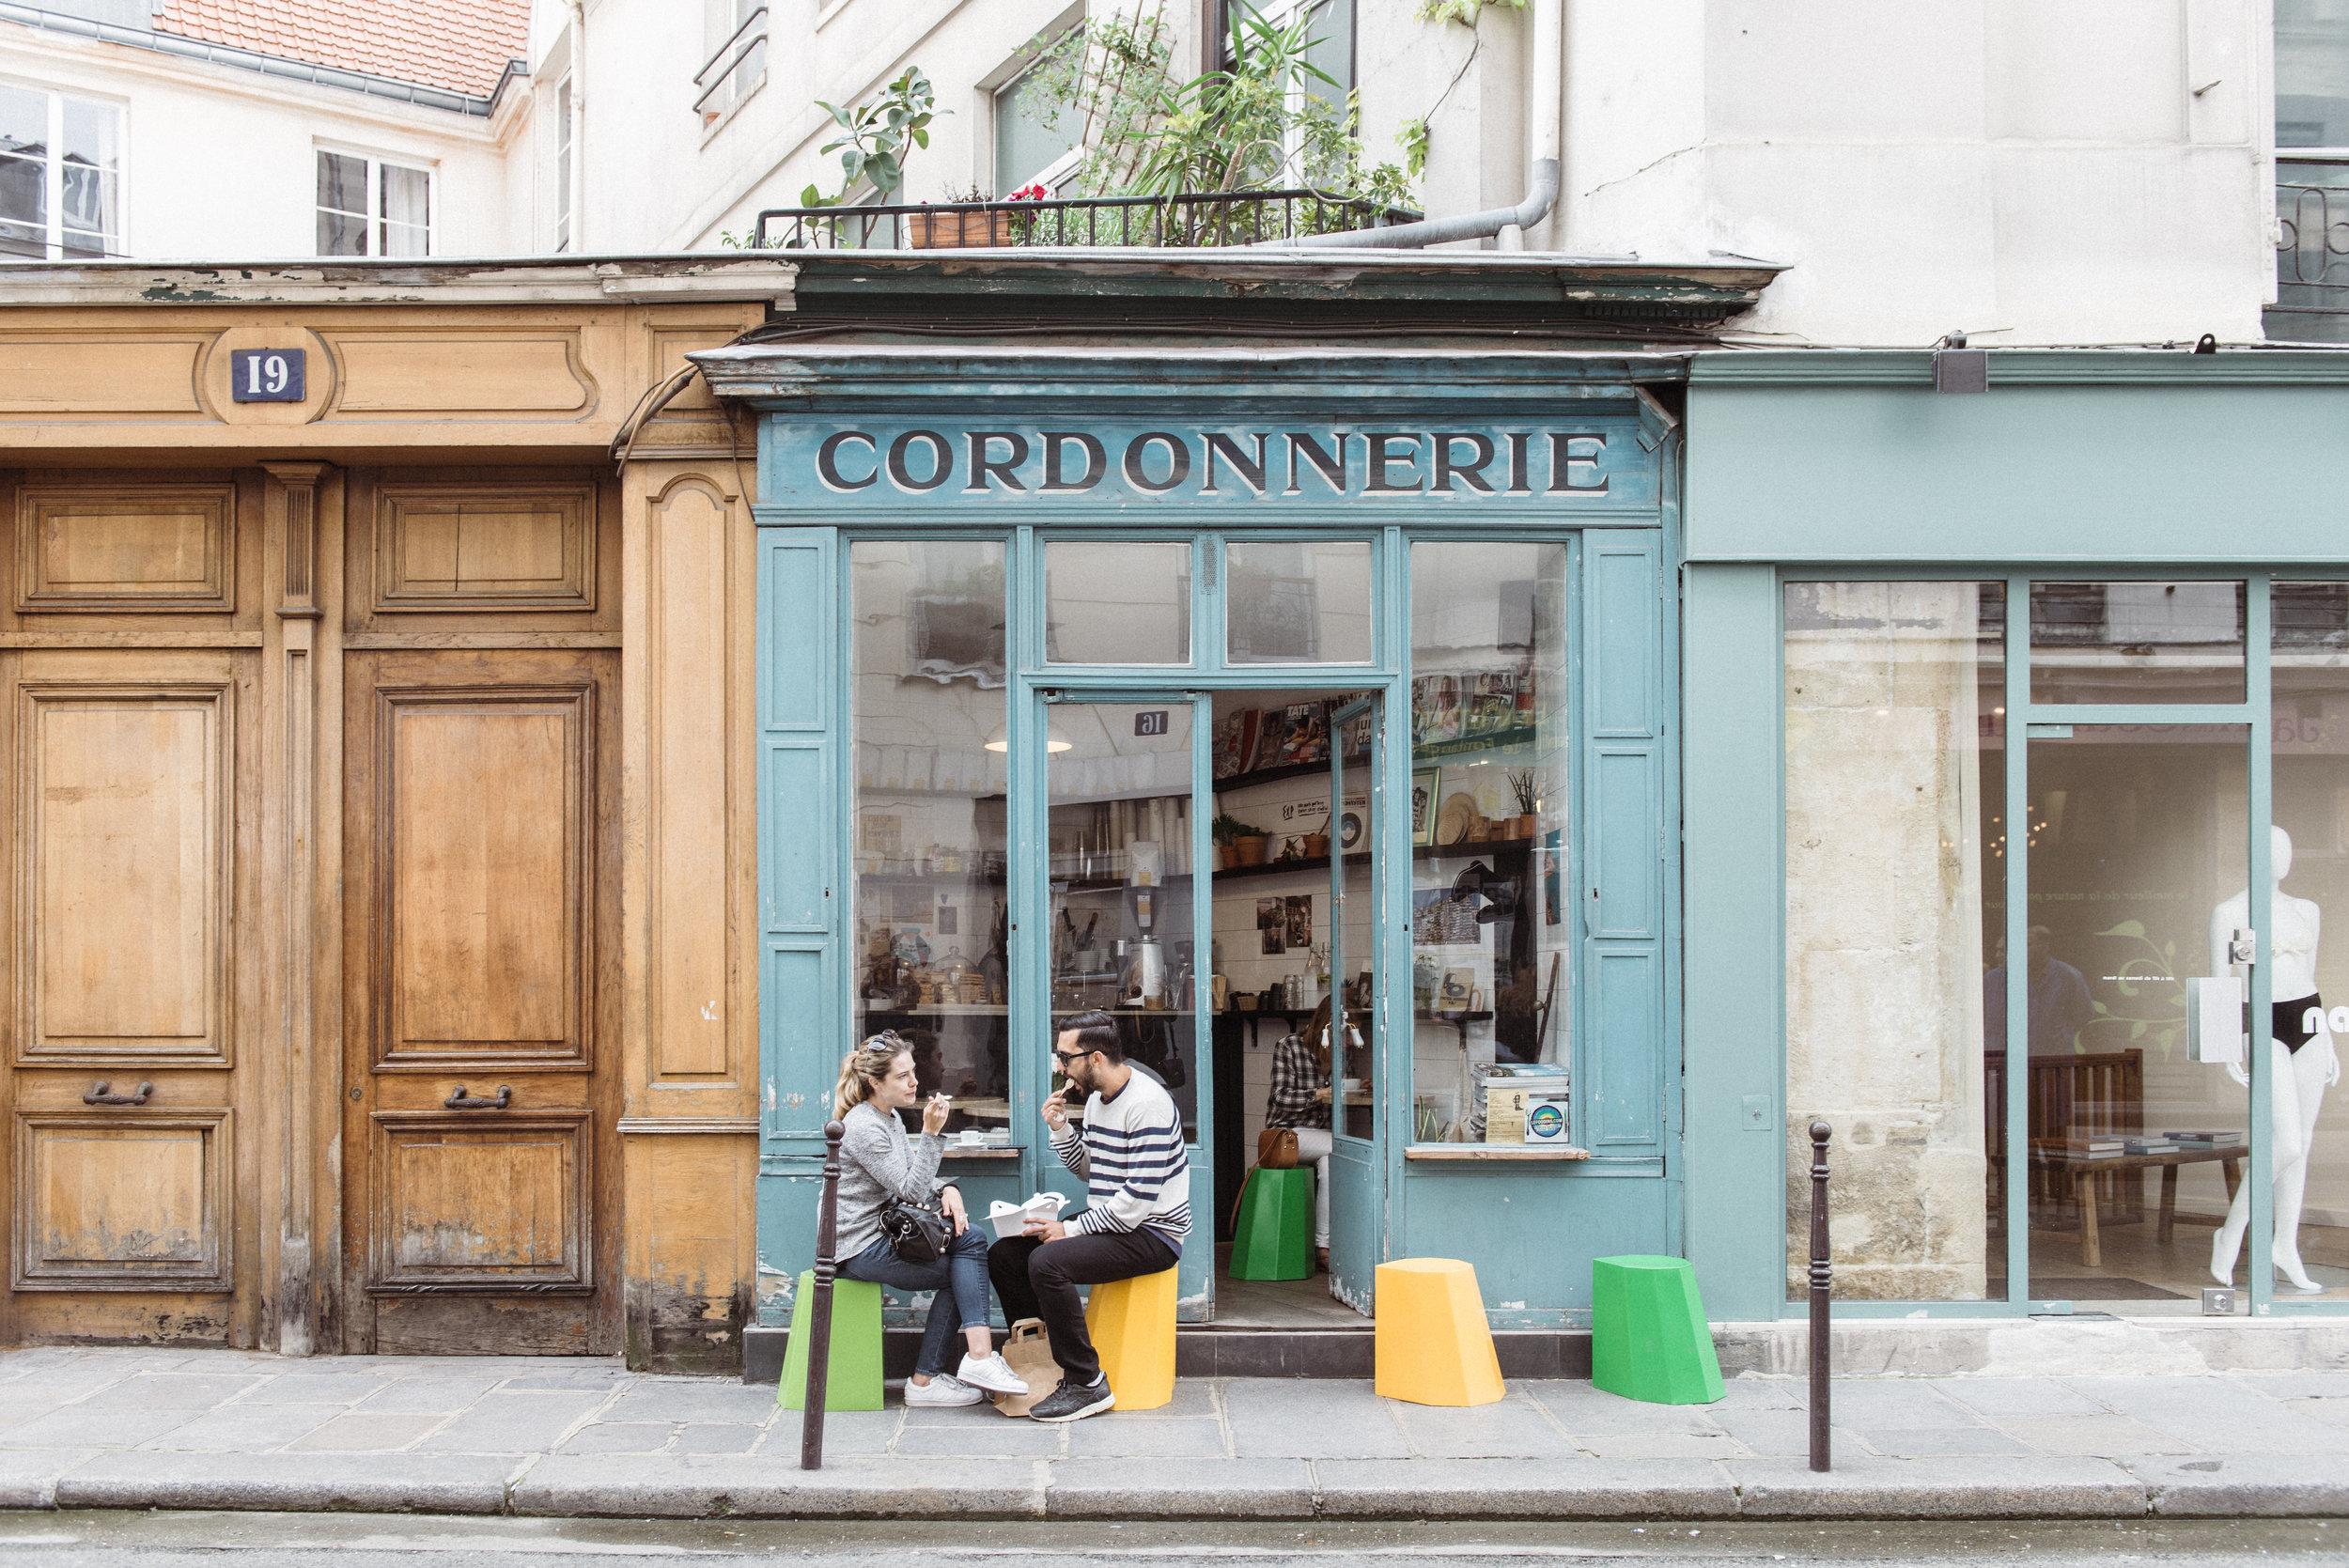 Paris France Photo by Carley Rudd